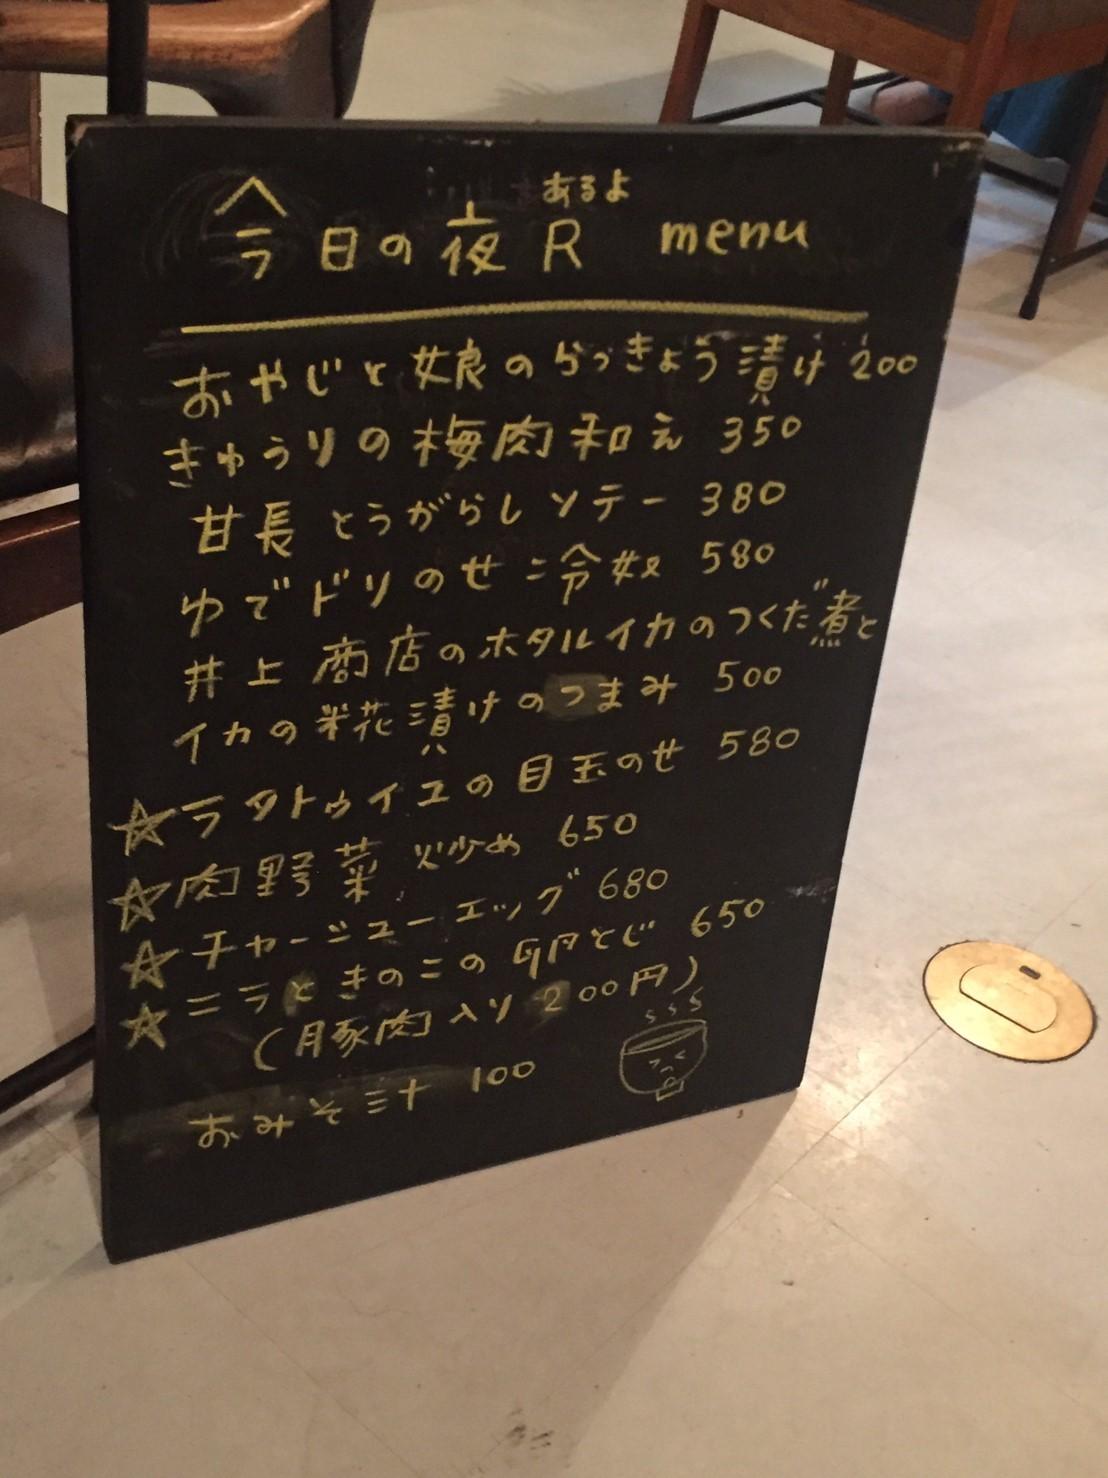 TAO CAFE にて菊池さん飲み_e0115904_07164682.jpg